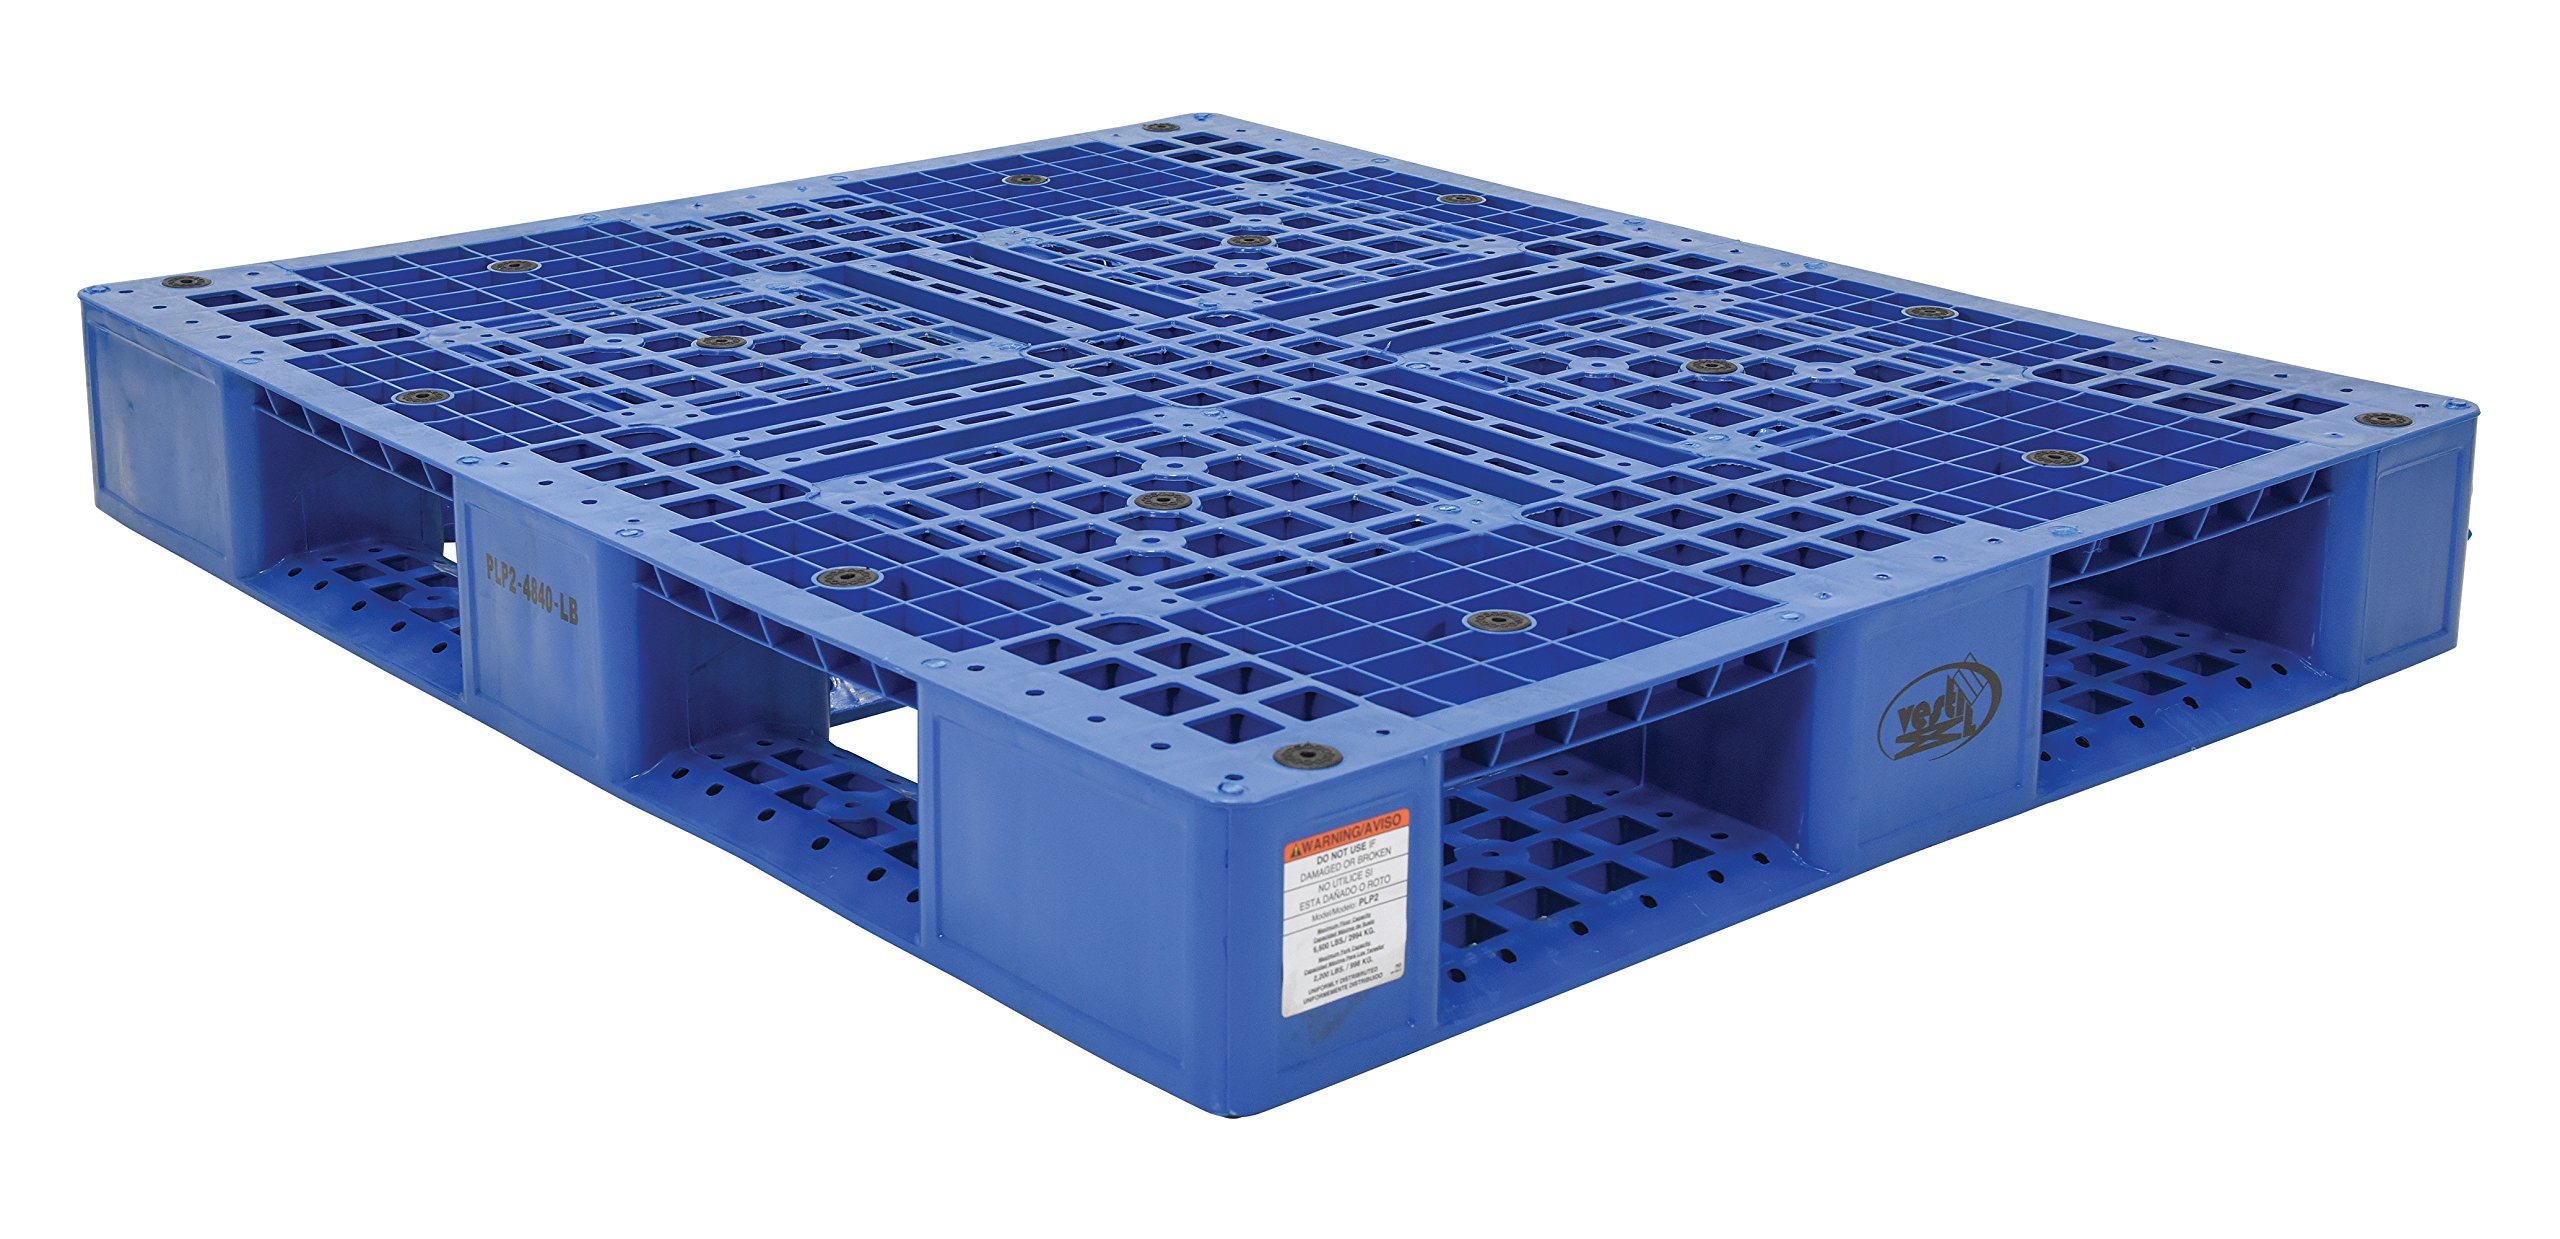 Vestil PLP2-4840-BLUE Blue Polyethylene Pallet with 4 Way Entry, 6600 lbs Capacity, 39.5'' Length, 47.375'' Width, 6'' Height